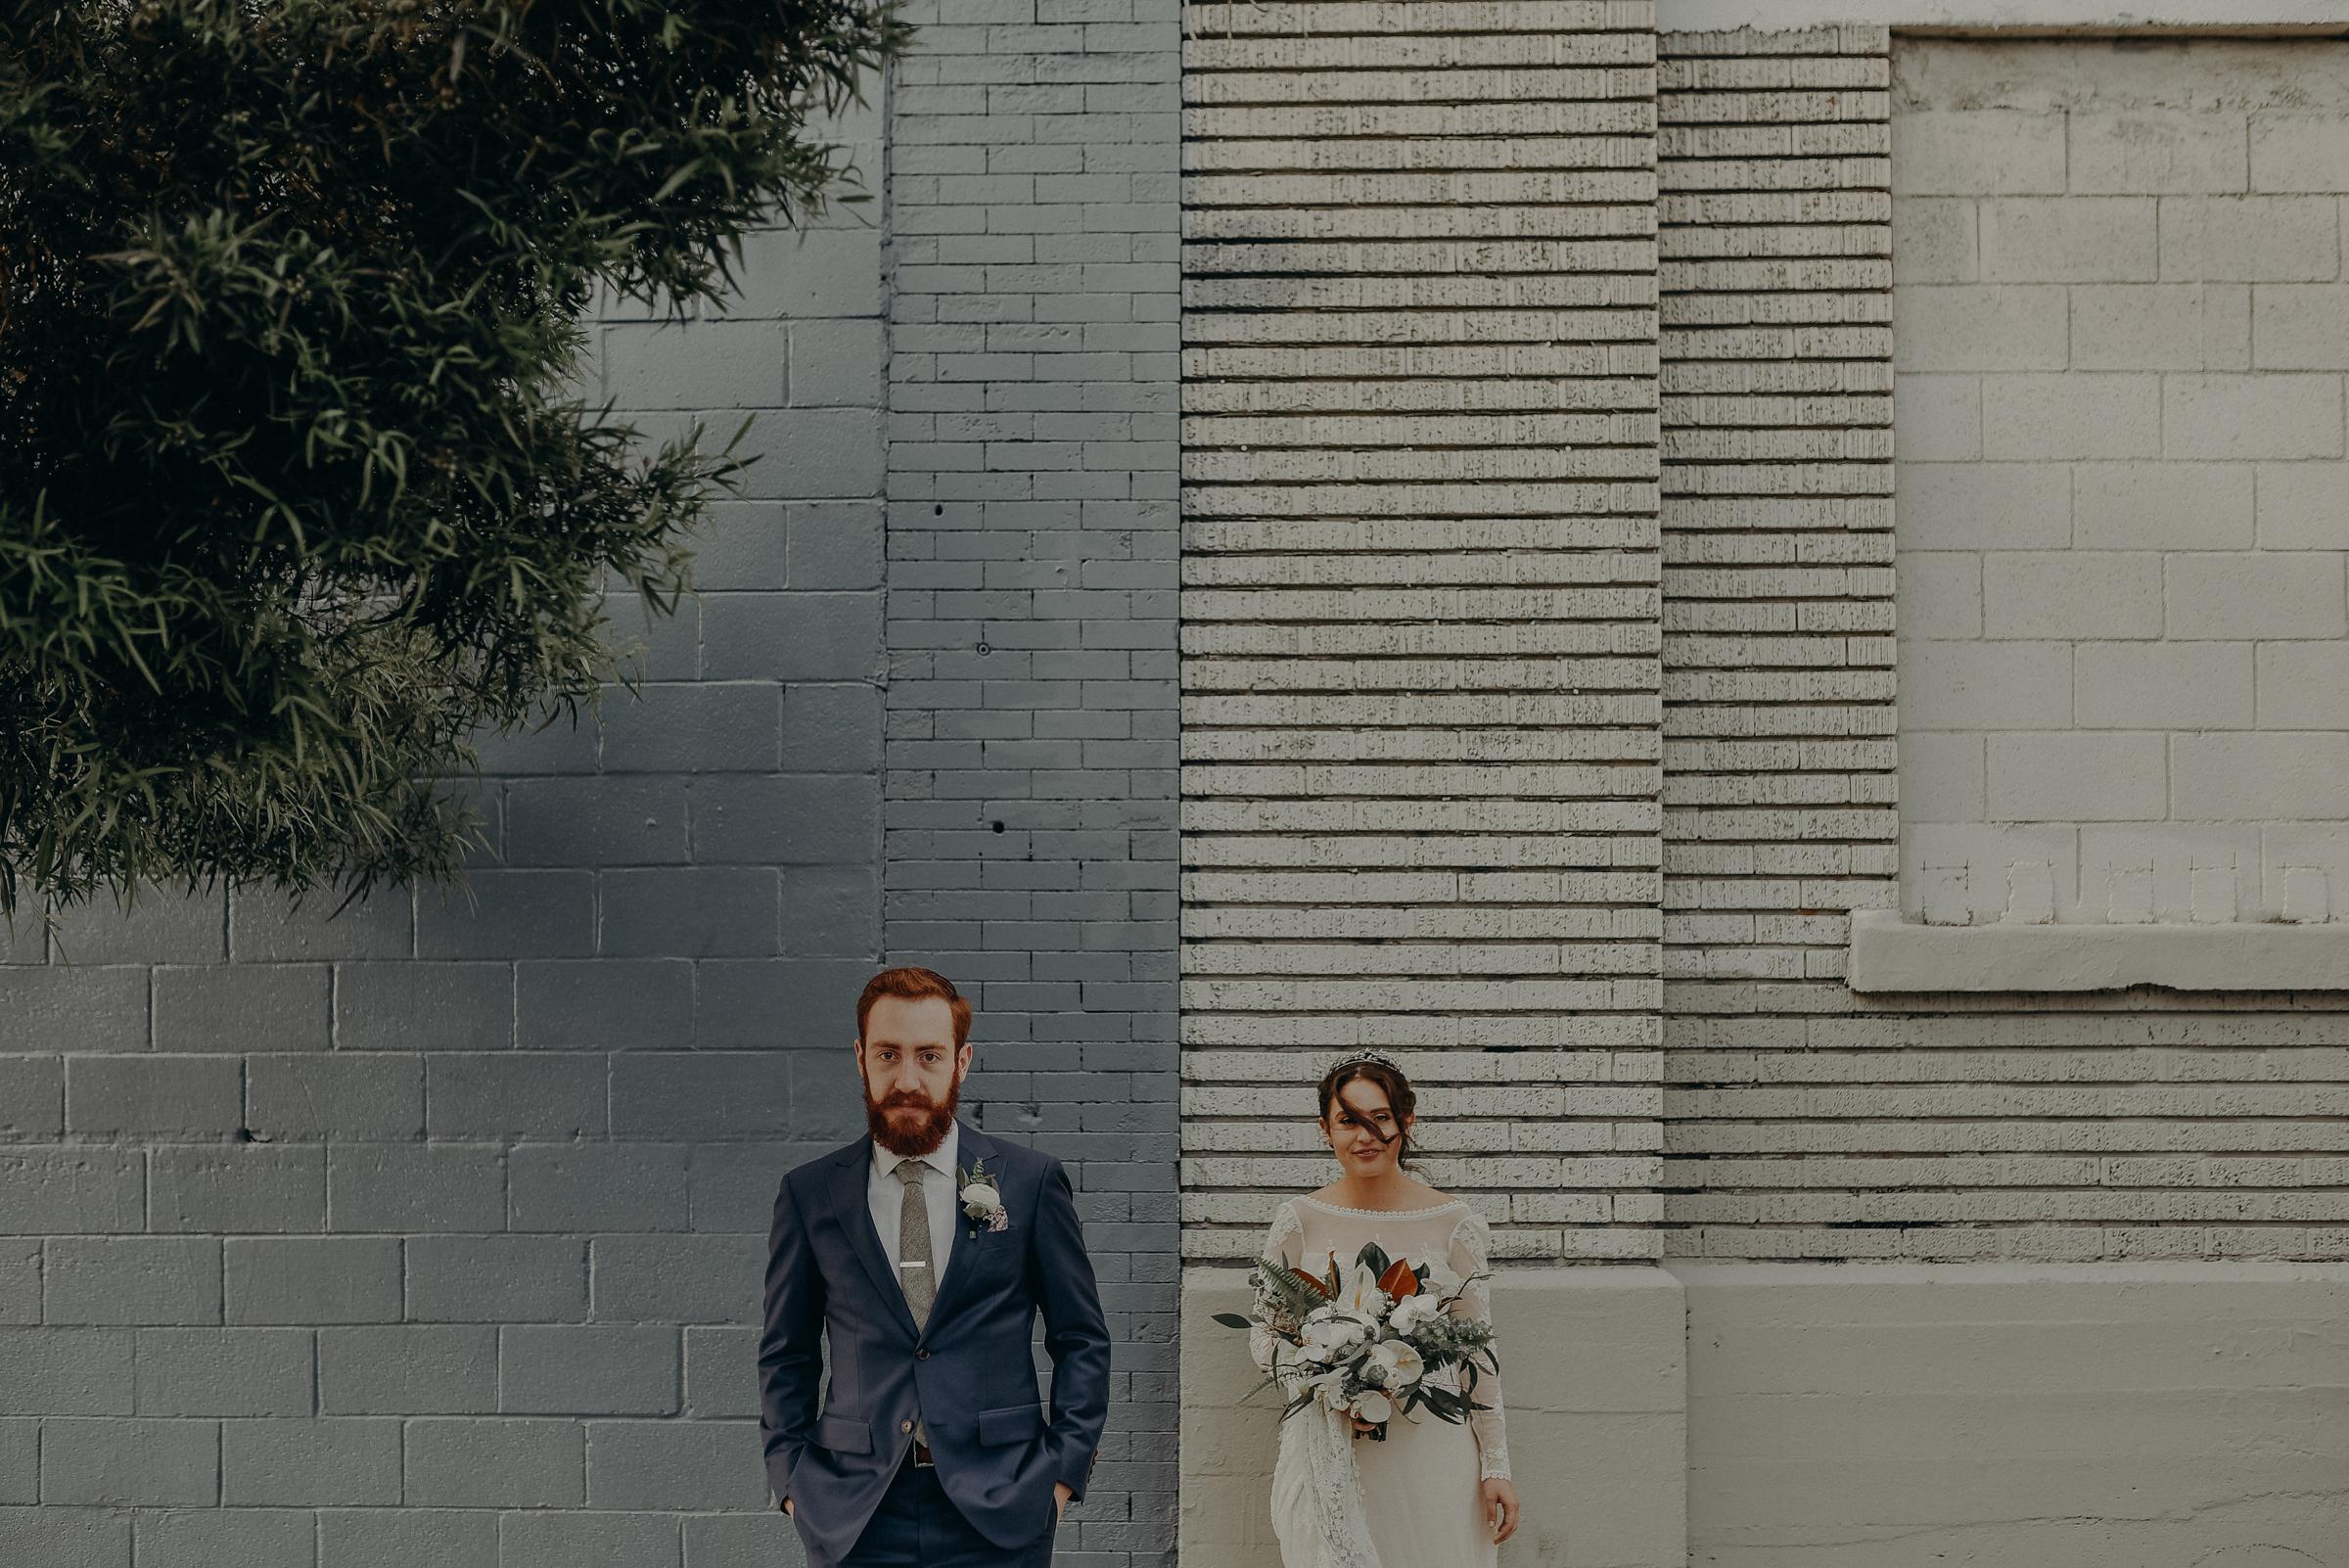 Isaiah + Taylor Photography - Los Angeles Wedding Photographers - The Unique Space Venue-017.jpg